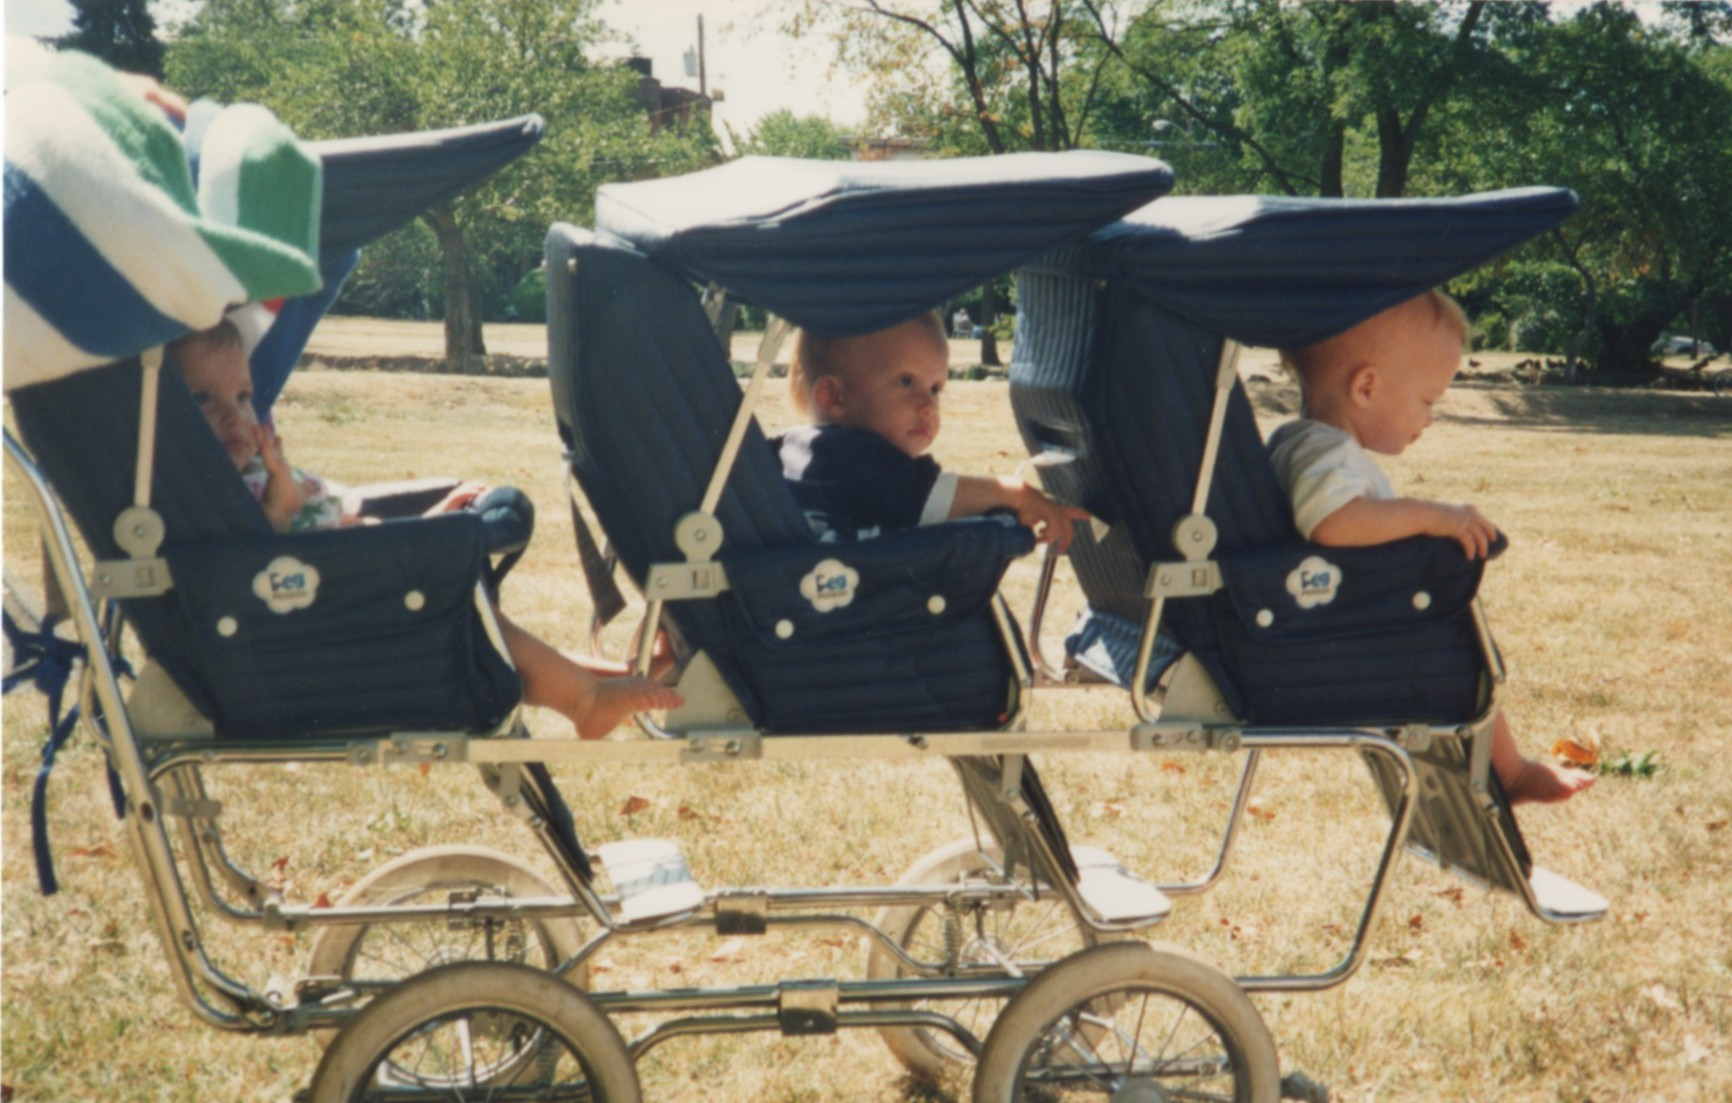 The triplet stroller turned heads.